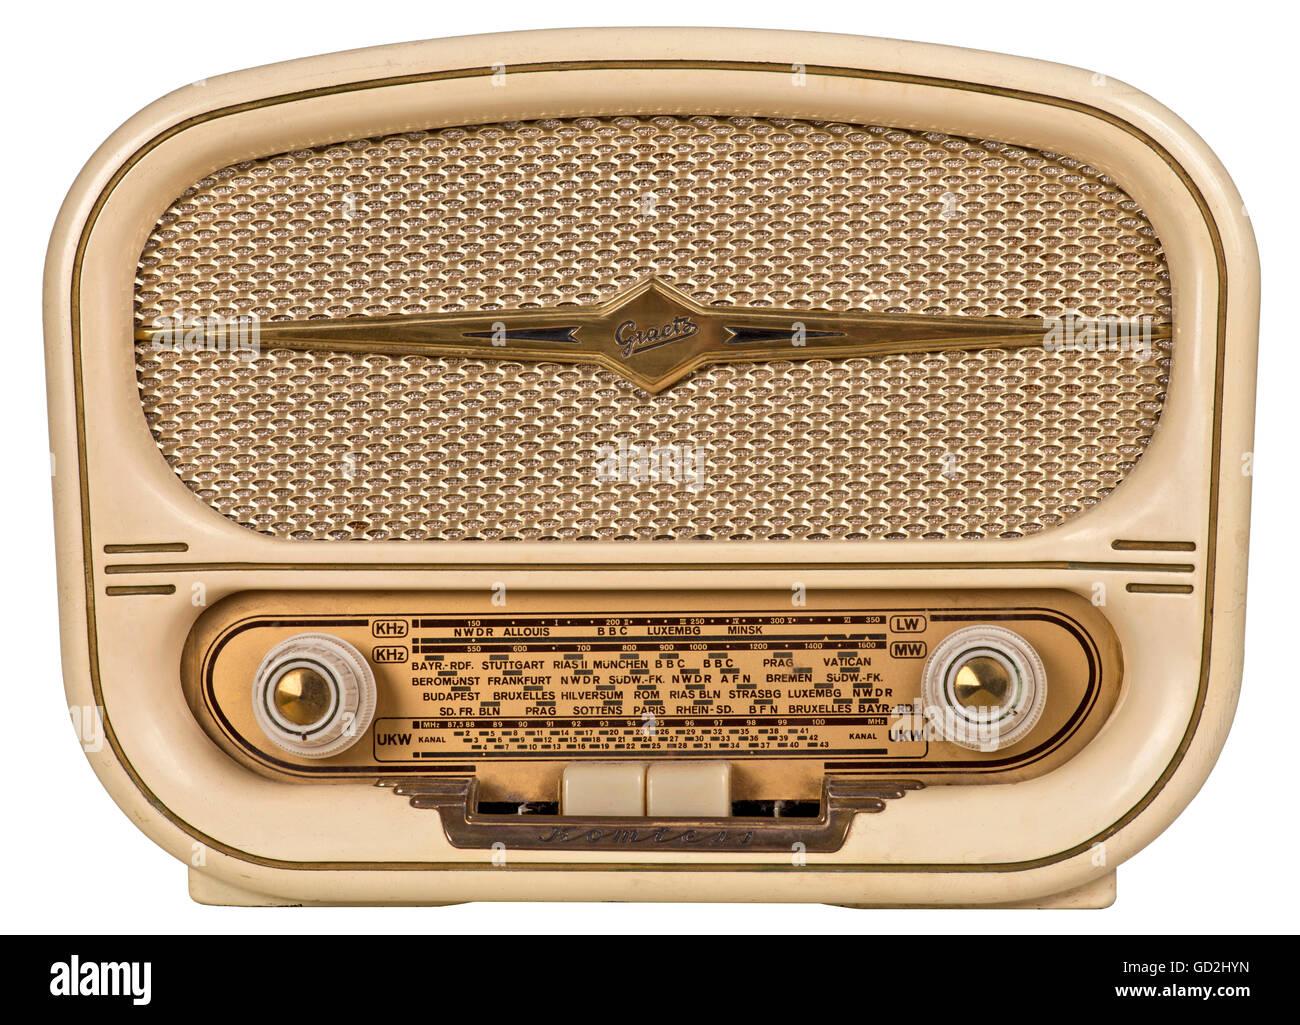 broadcast, radio, Graetz Komtess 214, small tube radio, dimensions: 31x23 centimeter, Vollsuper, 6 tube, three wave - Stock Image